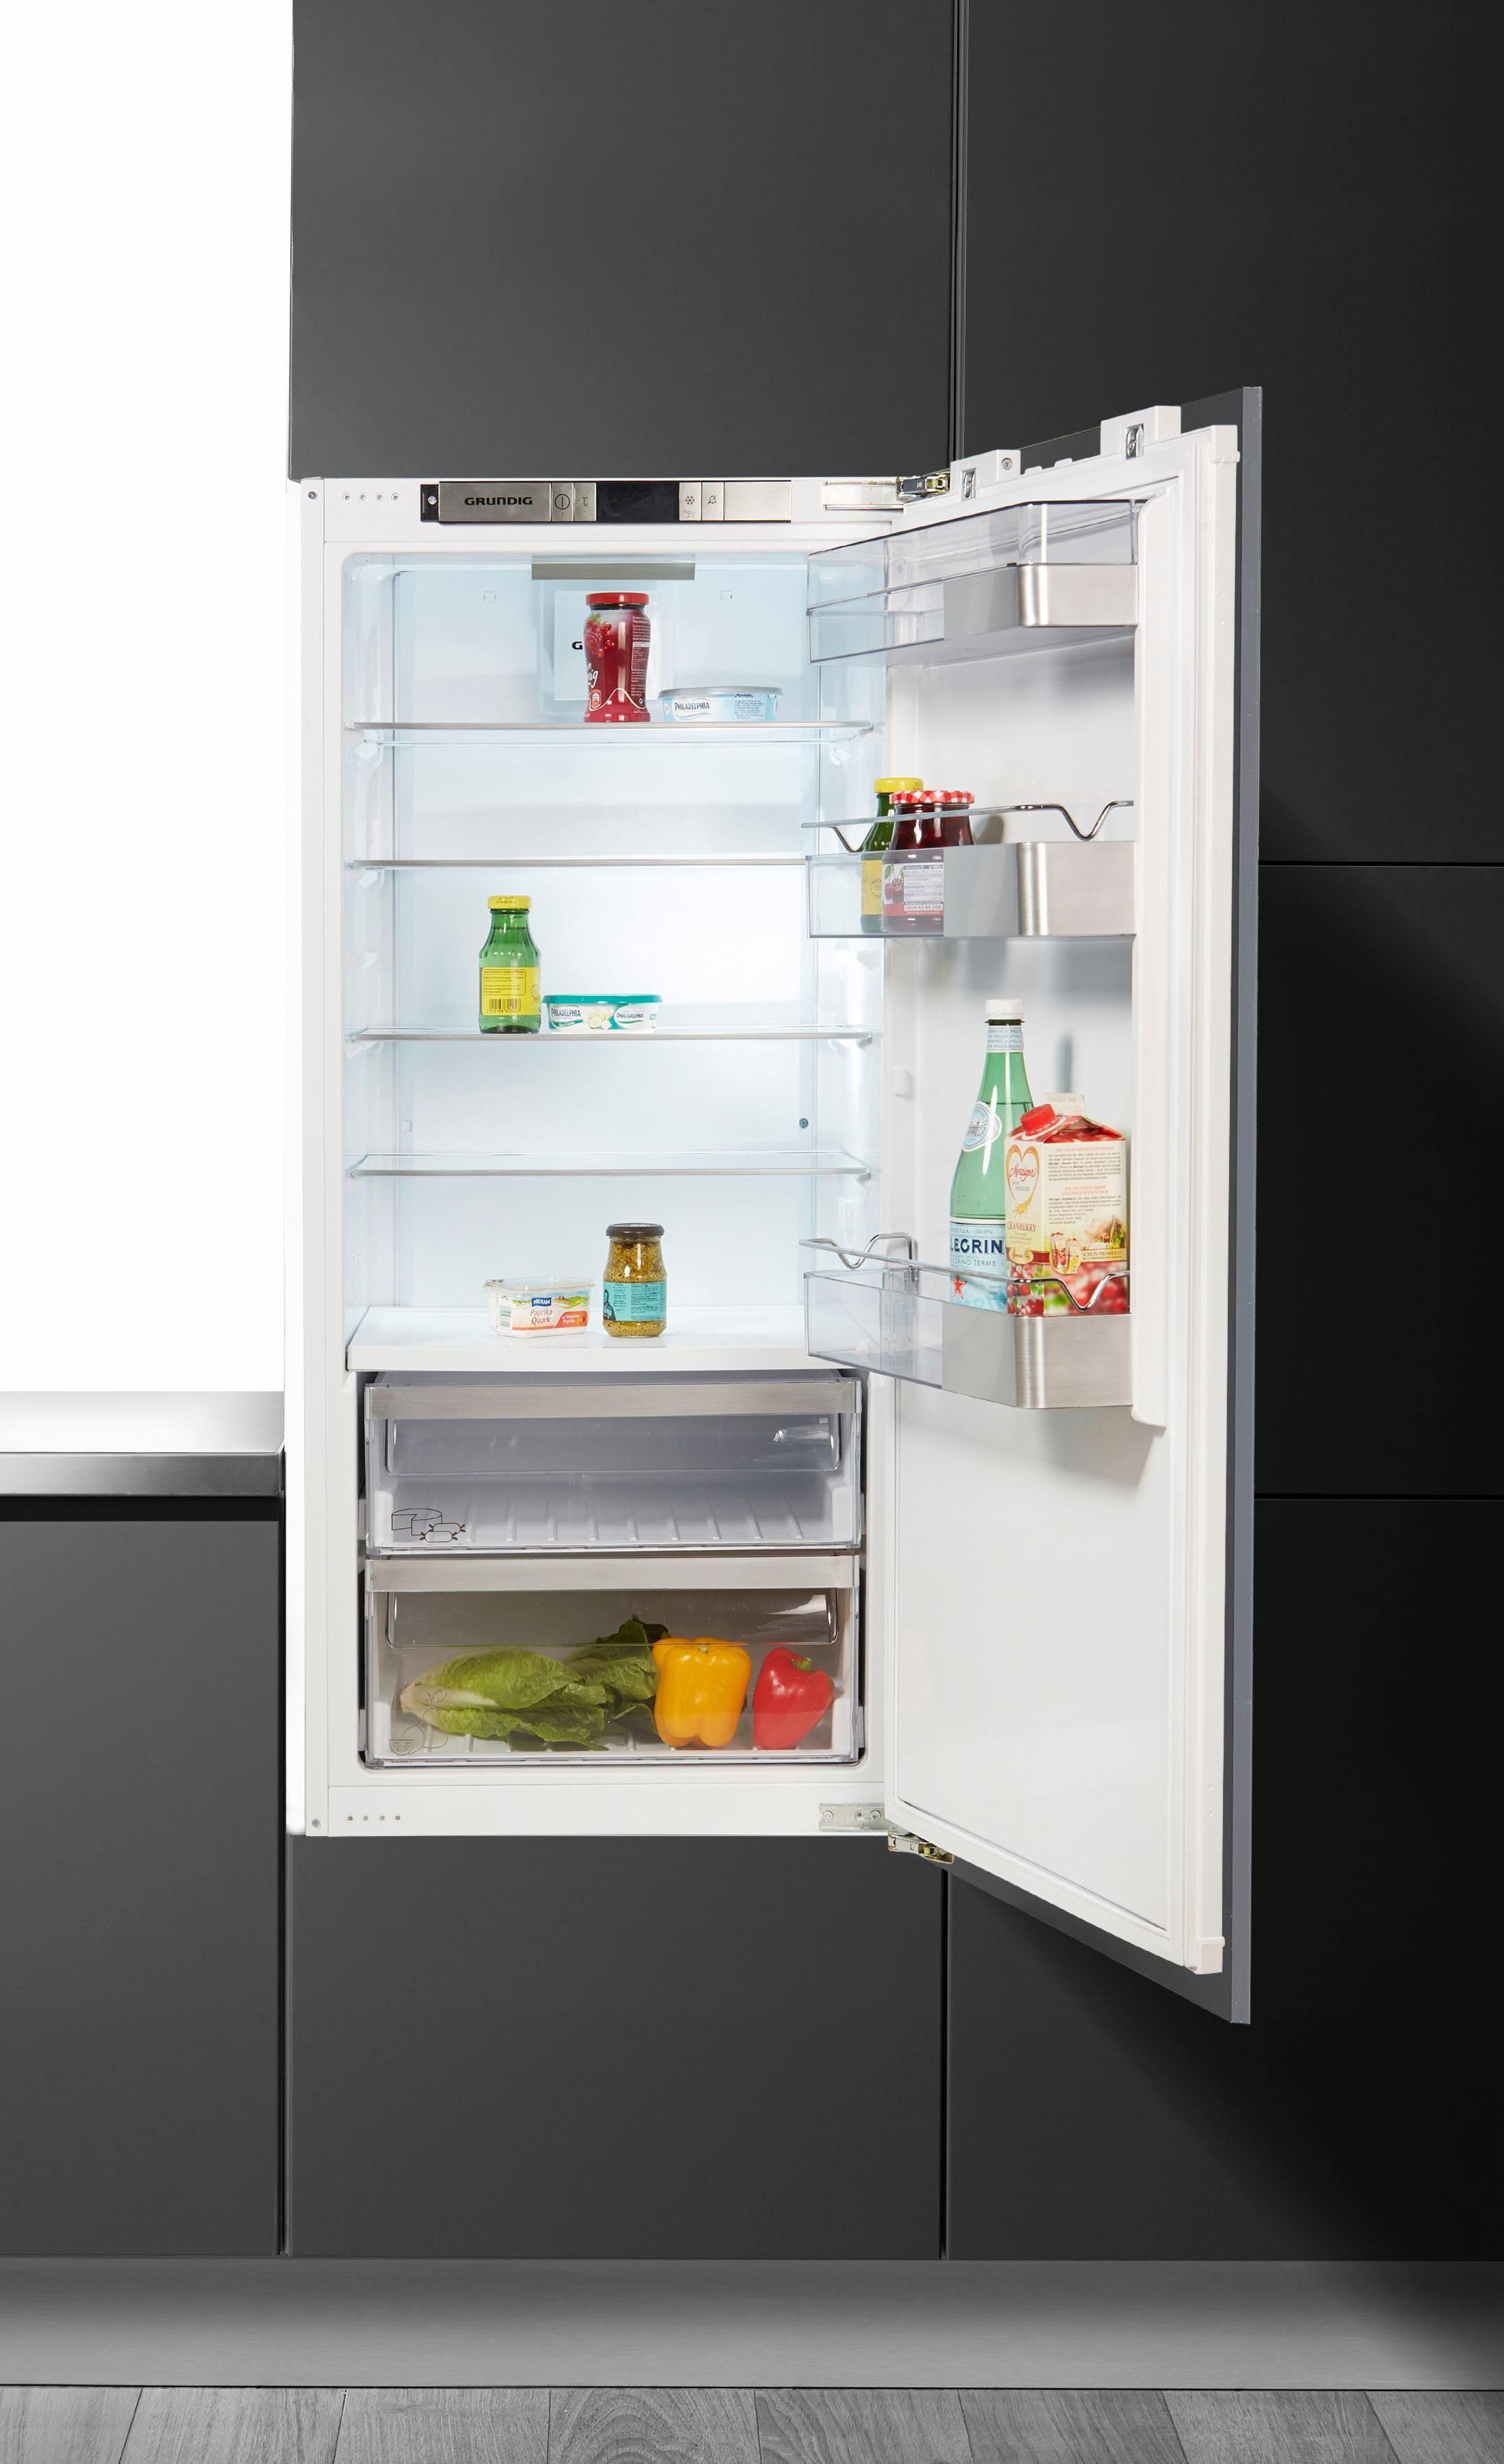 Grundig Einbaukühlschrank GTNI 10320, 122,5 cm hoch, 55,6 cm breit